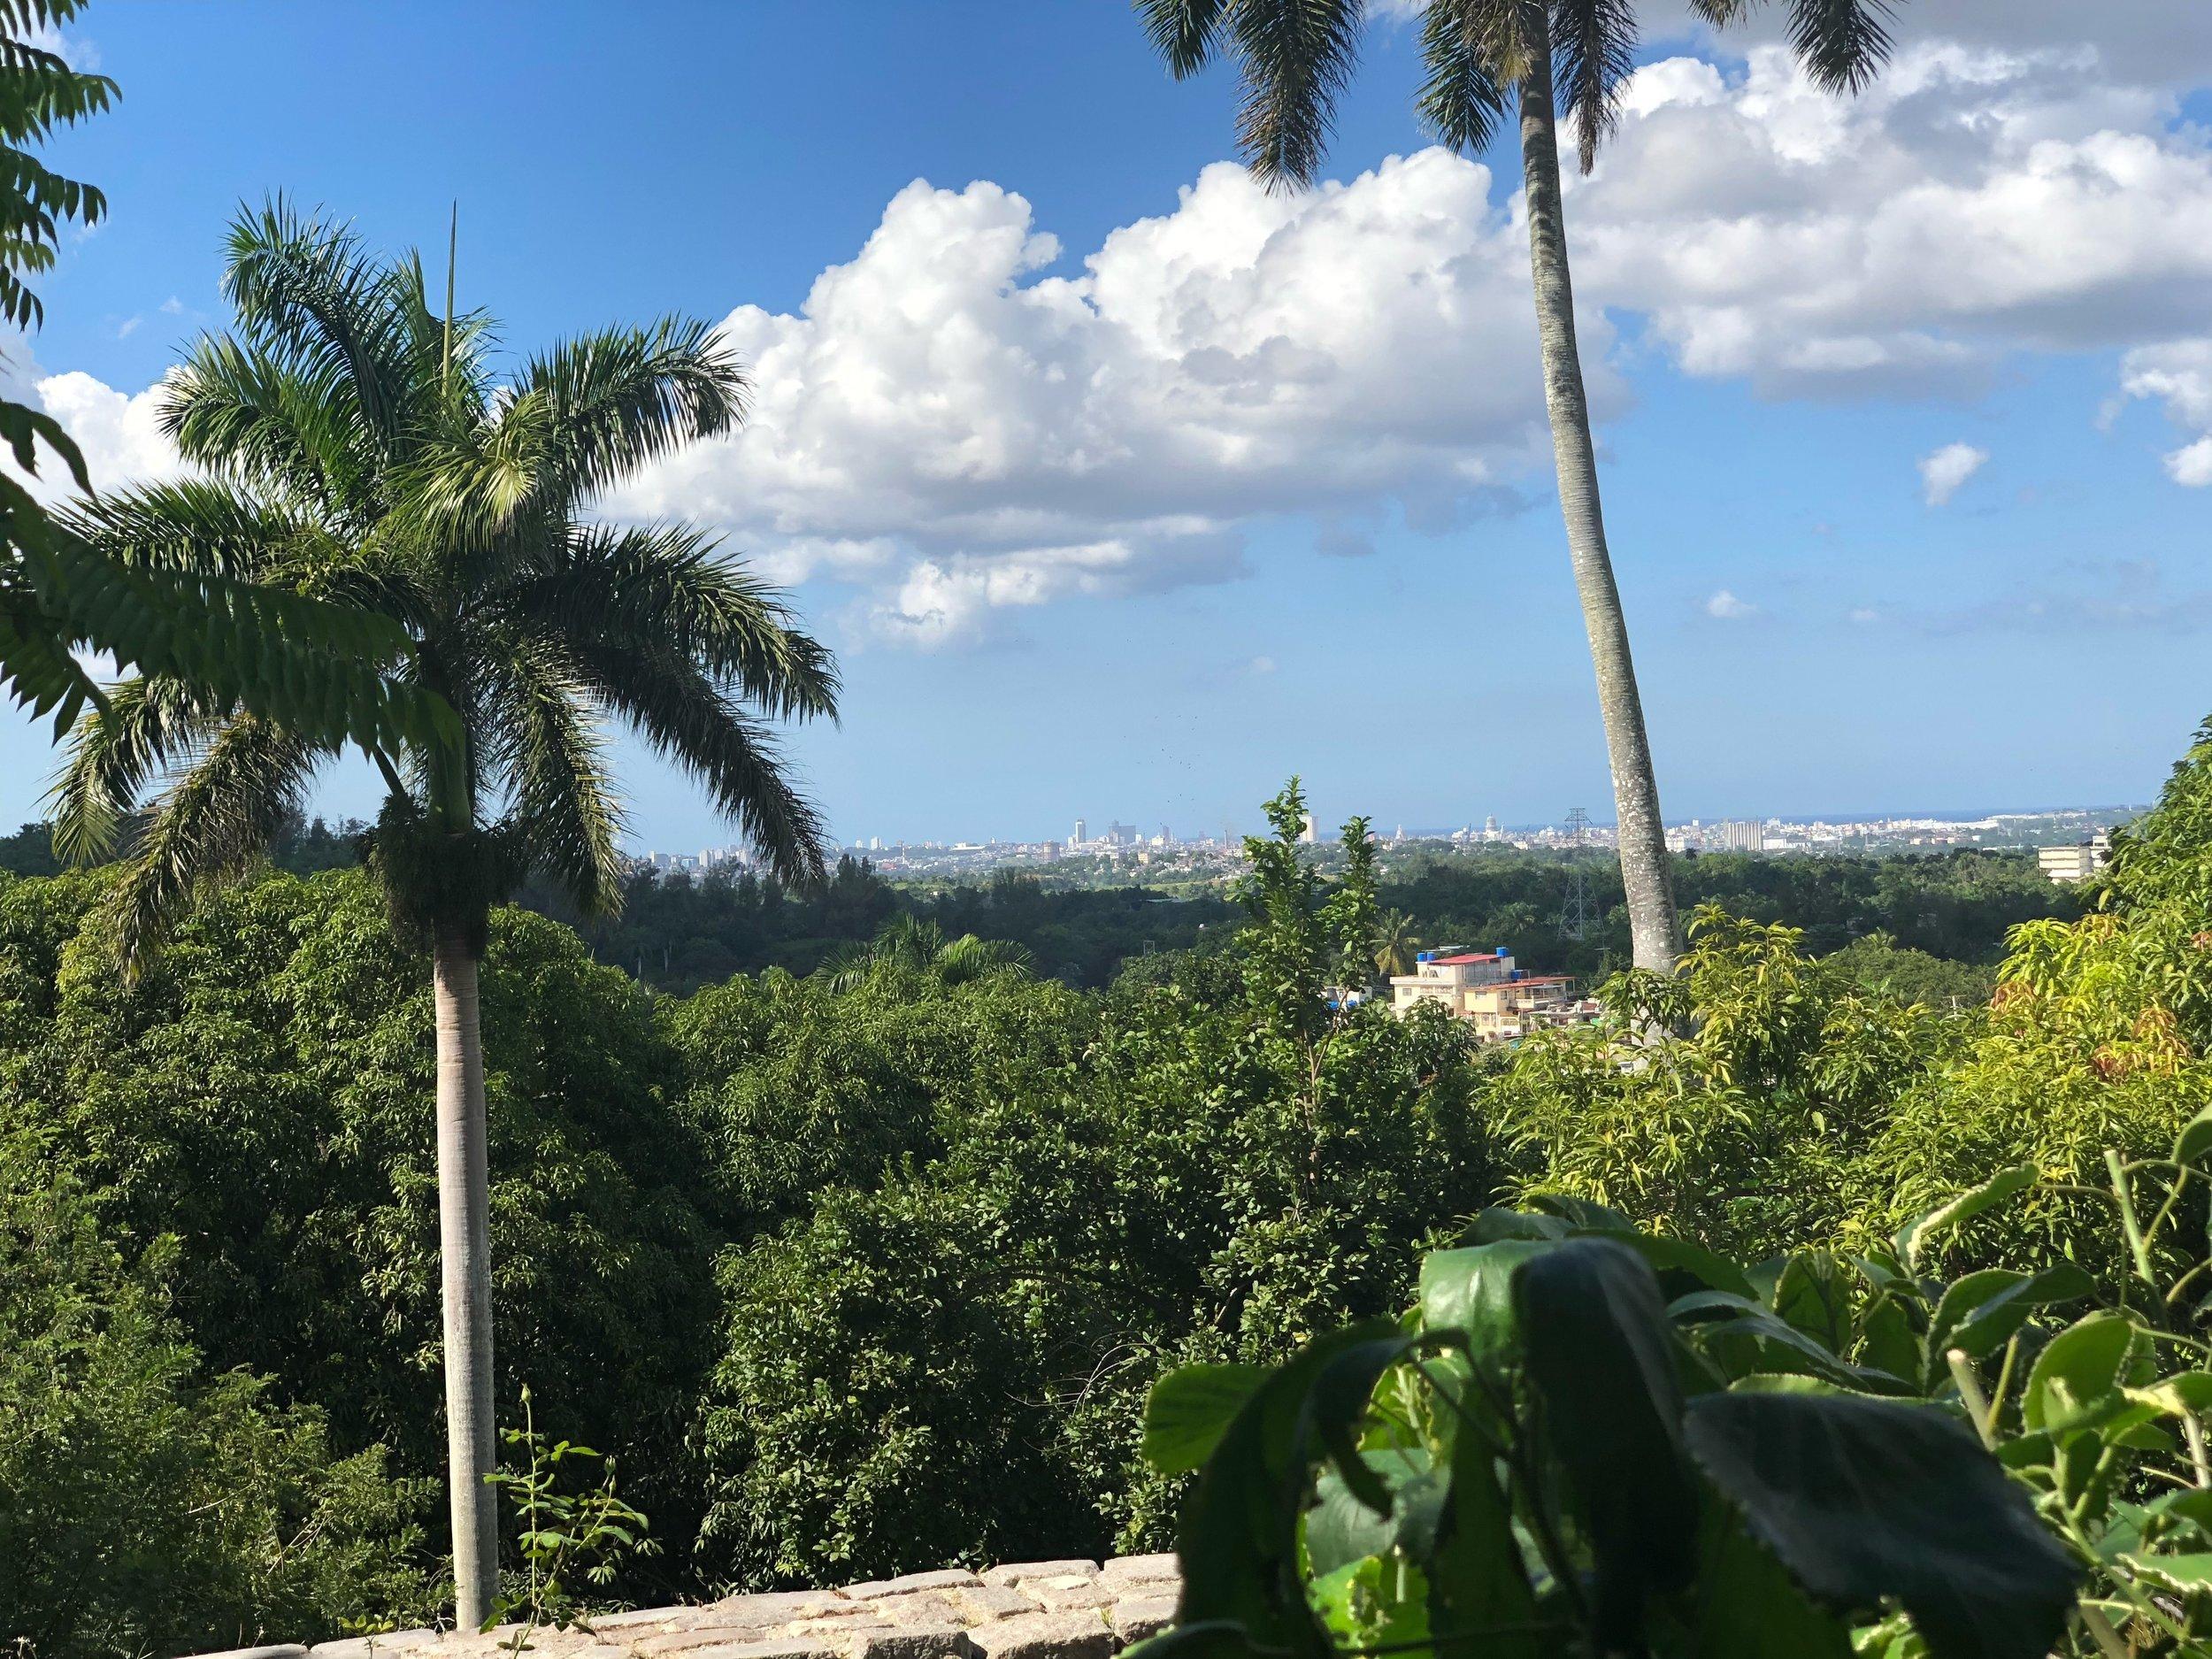 View of Havana from Hemingway House